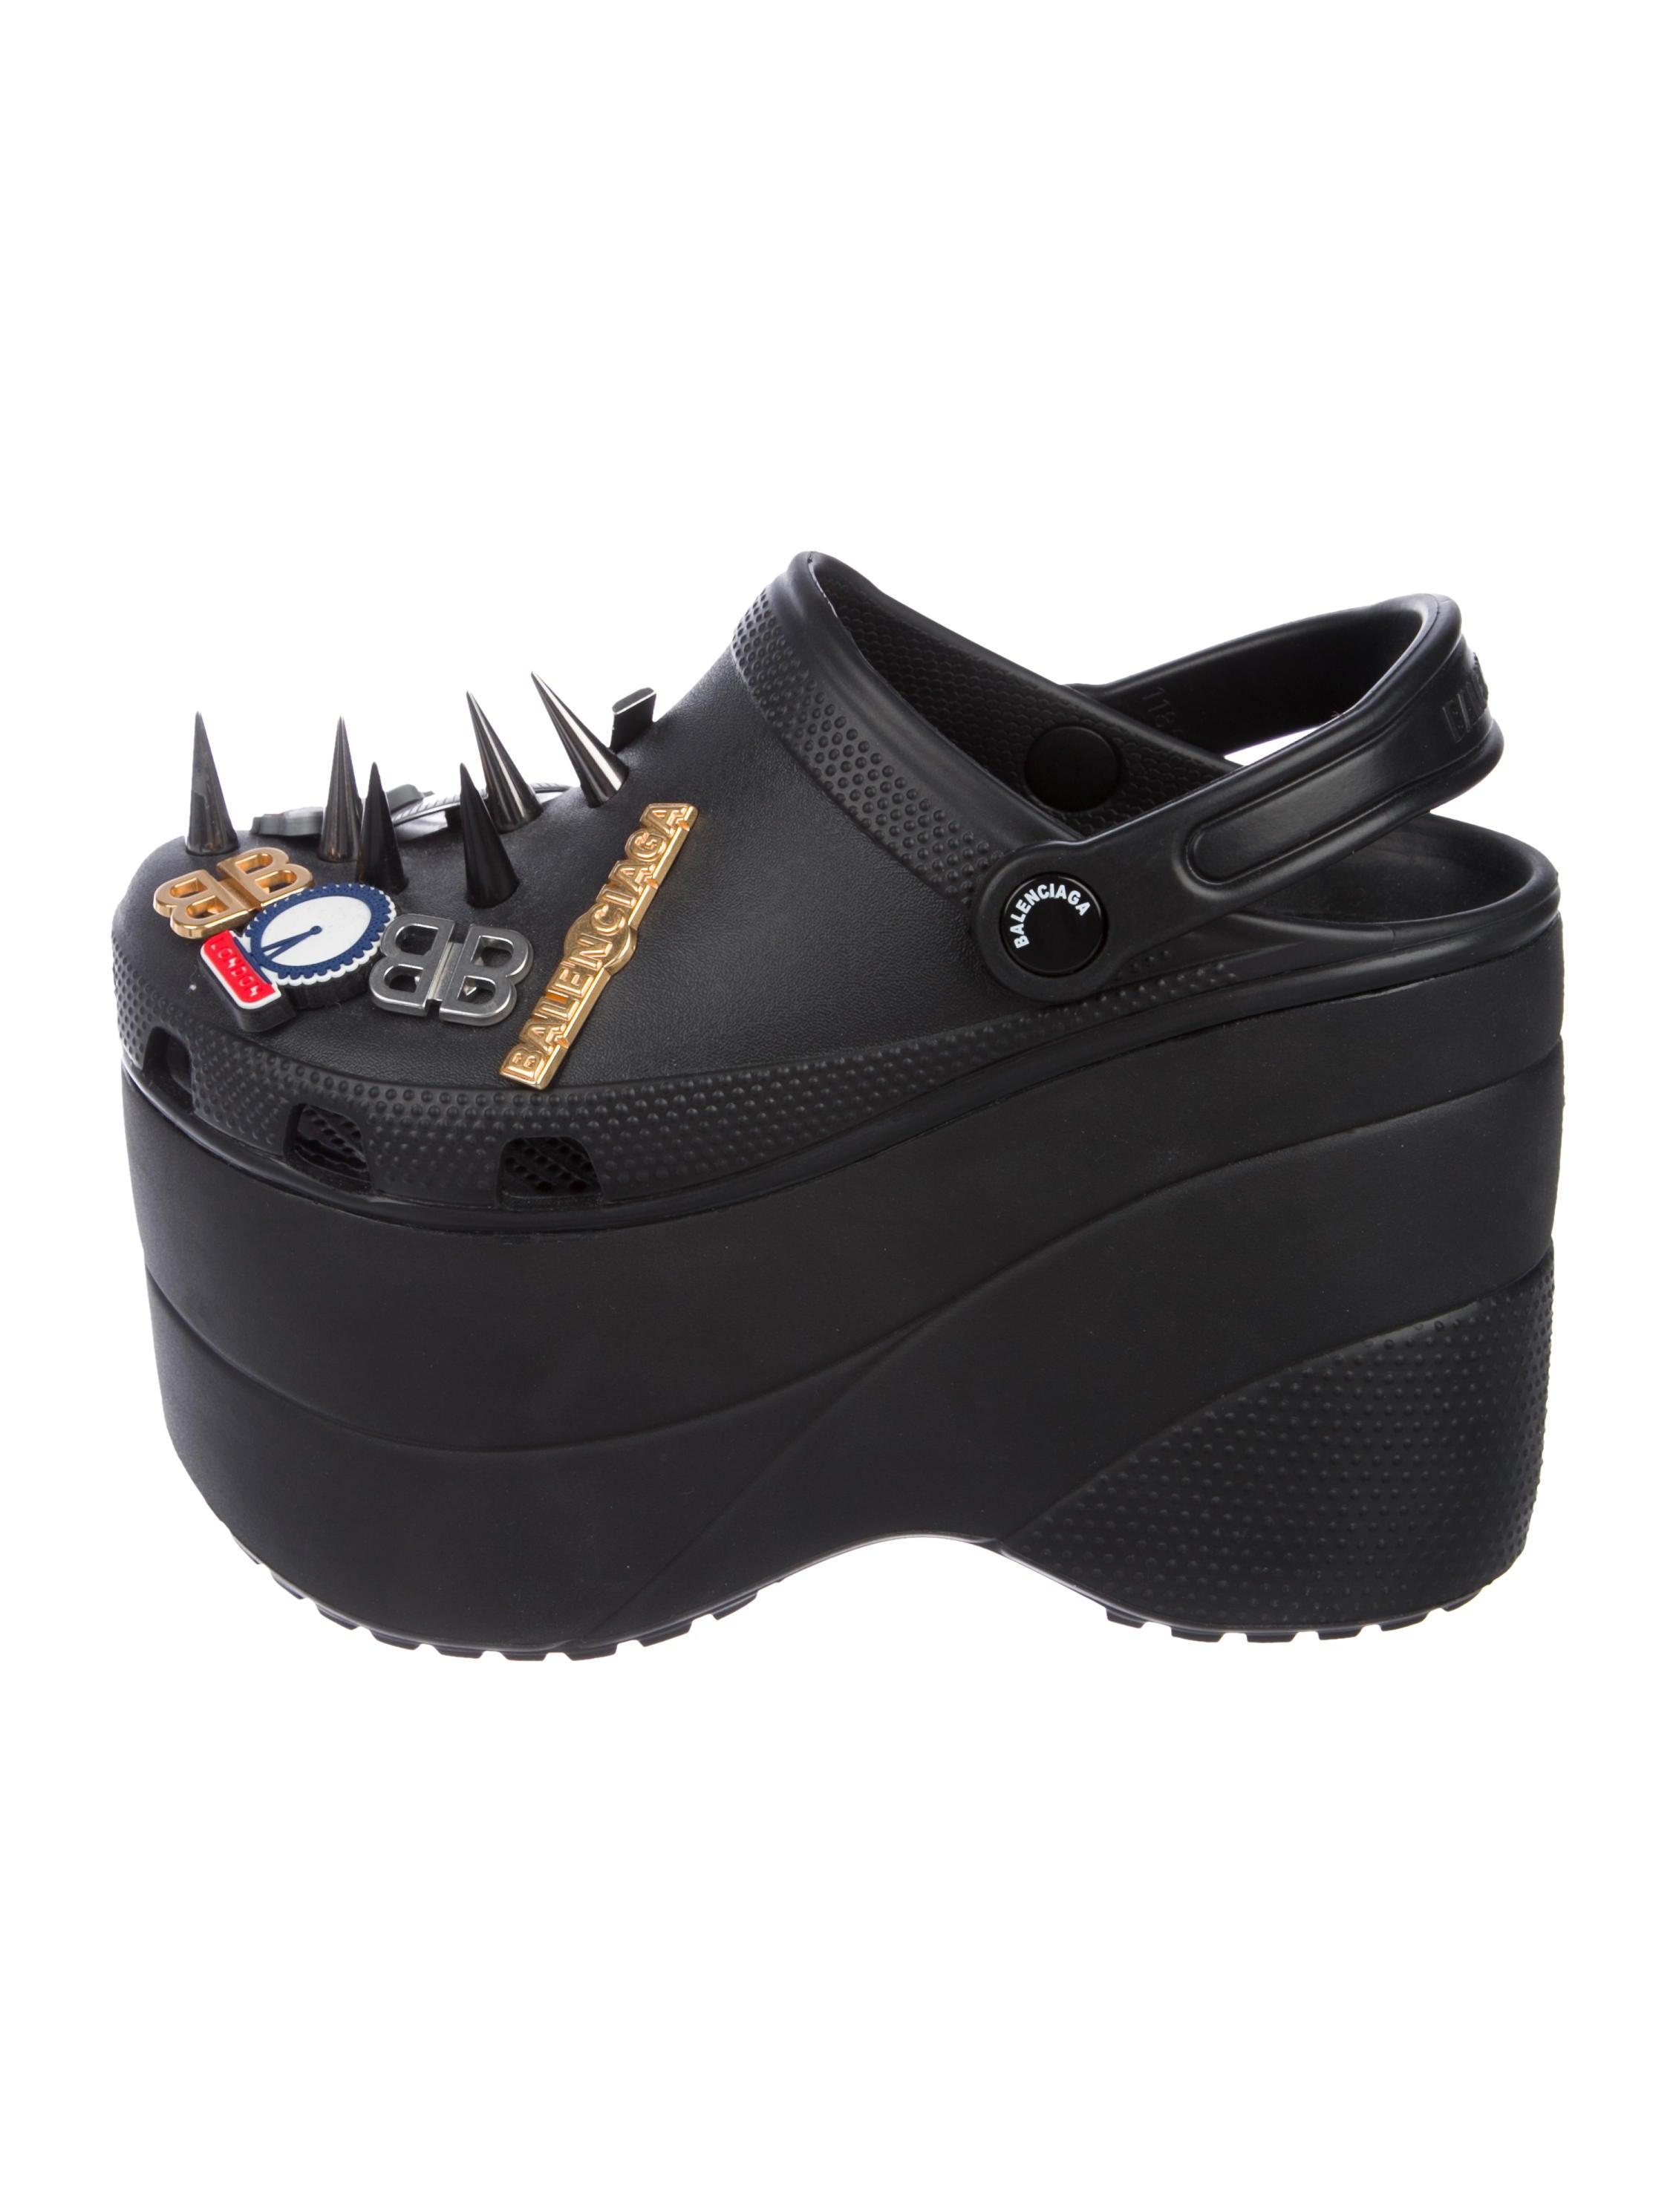 Balenciaga x Crocs Embellished Platform